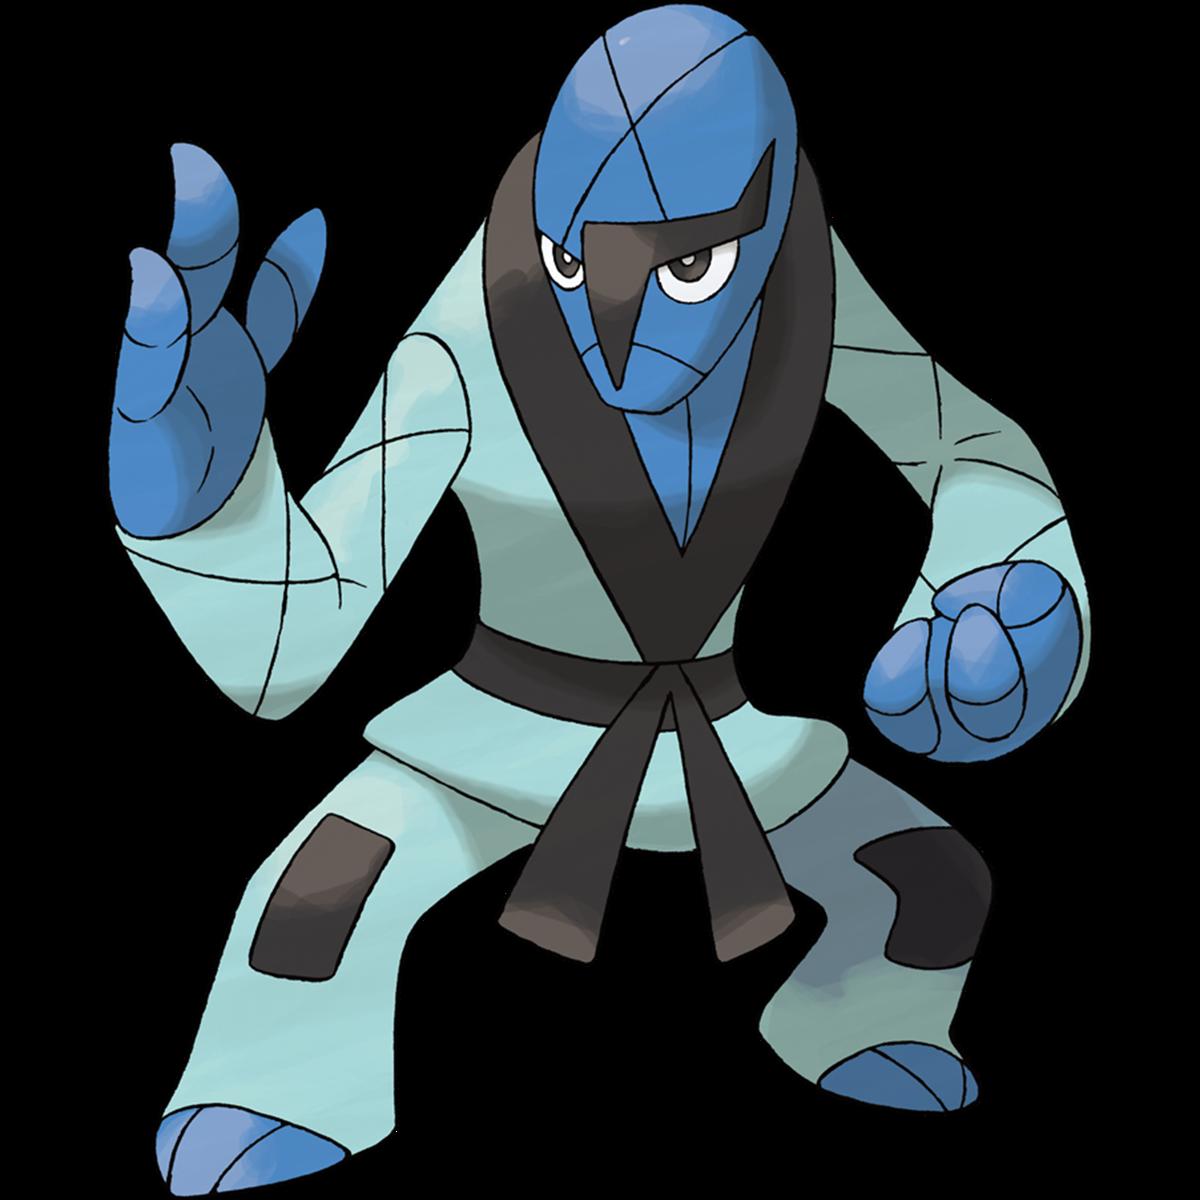 Sawk is exclusive to Pokémon Sword